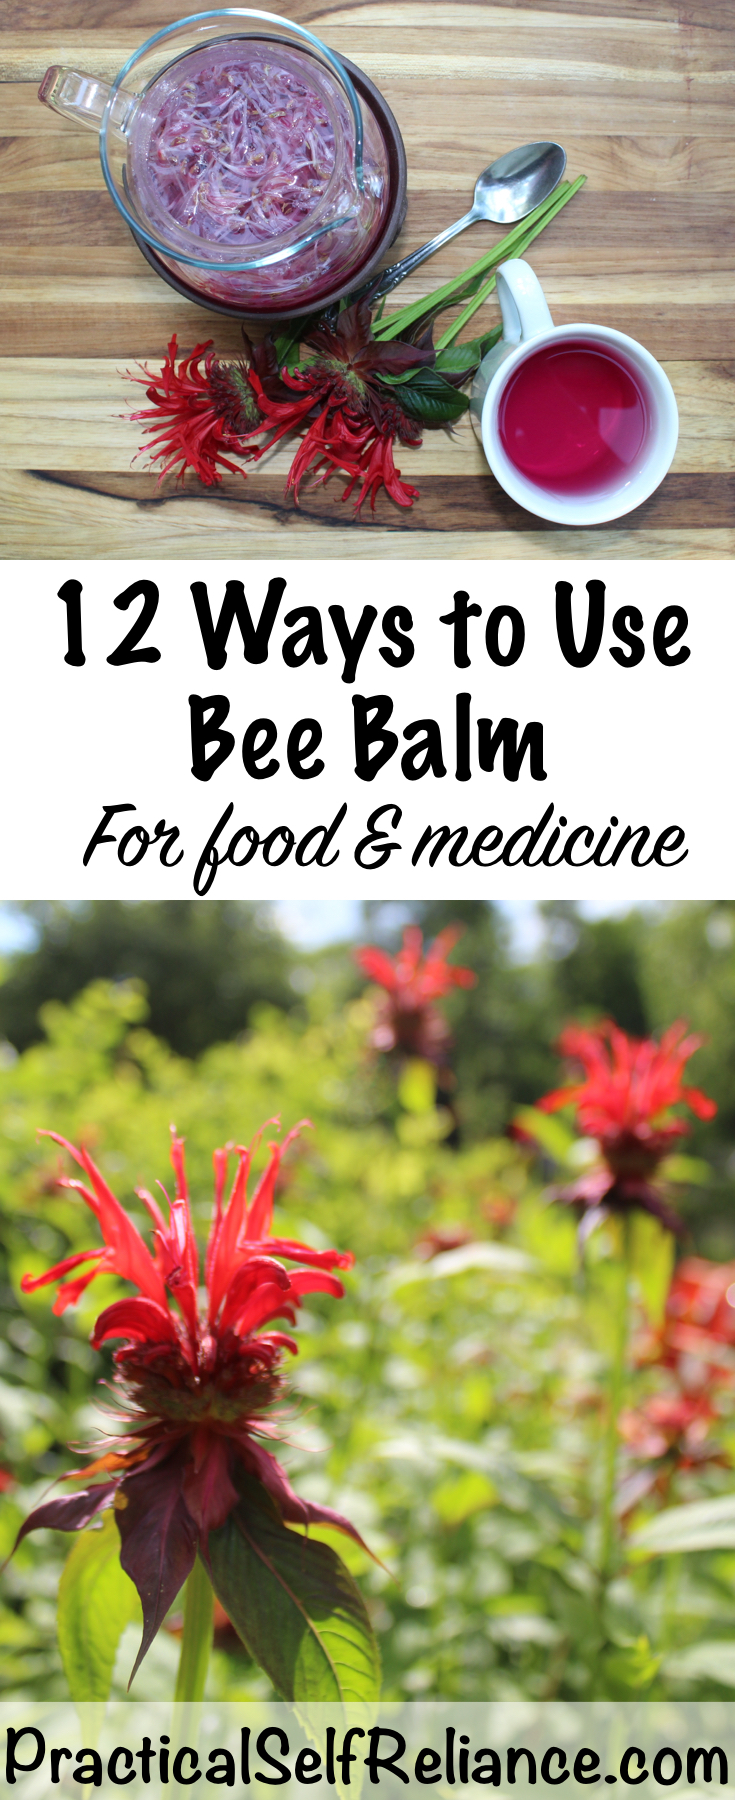 12 Ways to Use Bee Balm for Food & Medicine #beebalm #monarda #uses #herbs #herbalism #edibleflowers  #herbalist